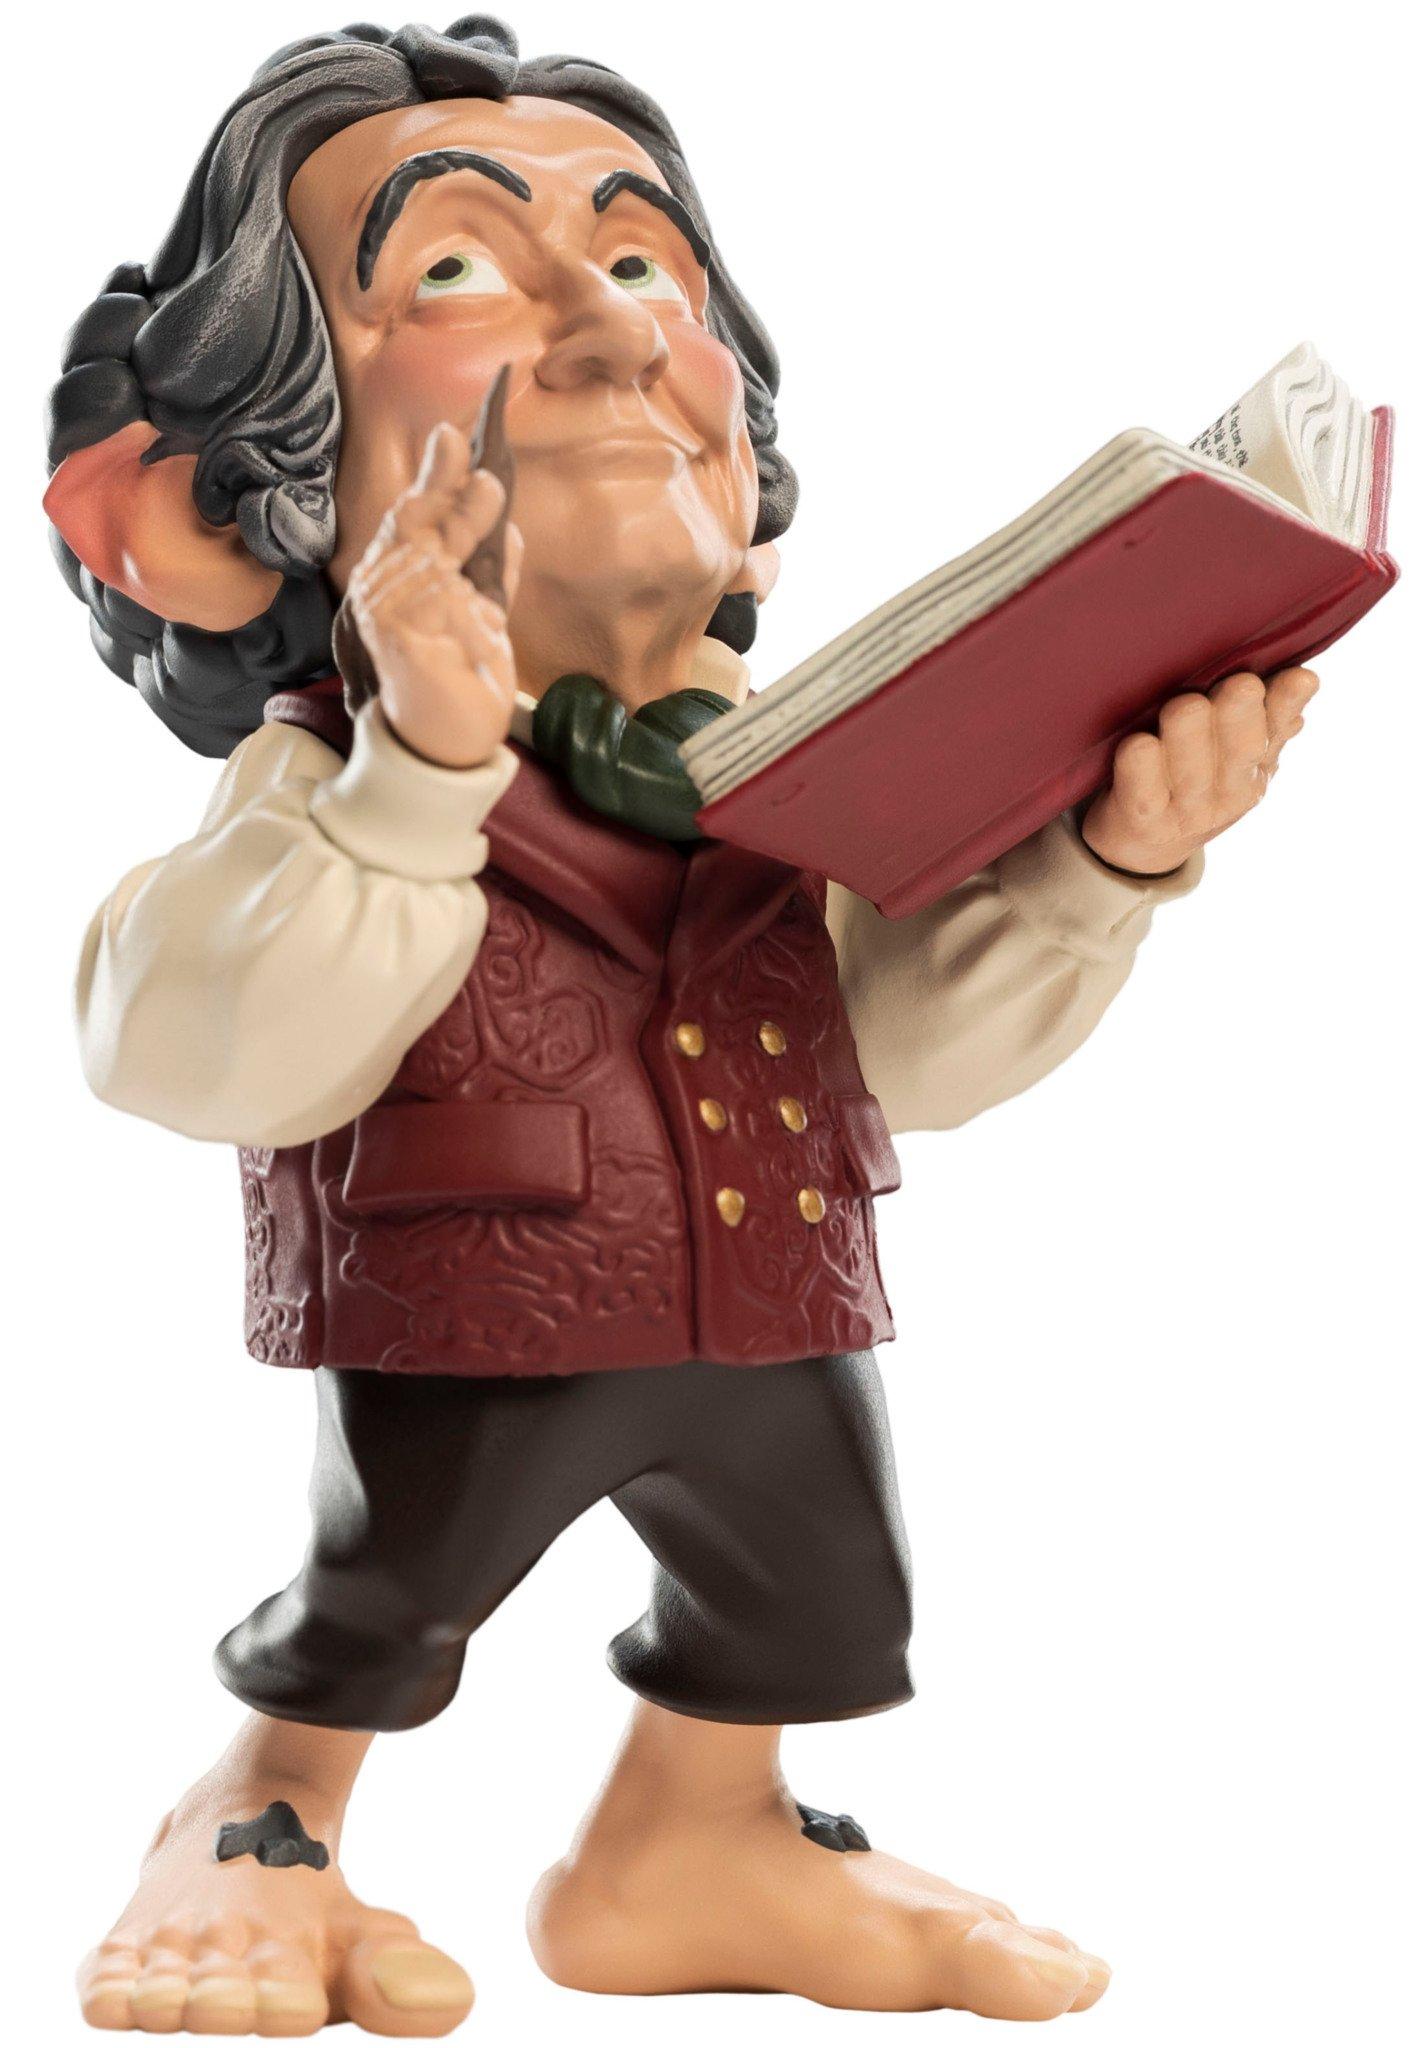 Lord of the Rings Mini Epics - Bilbo Baggins